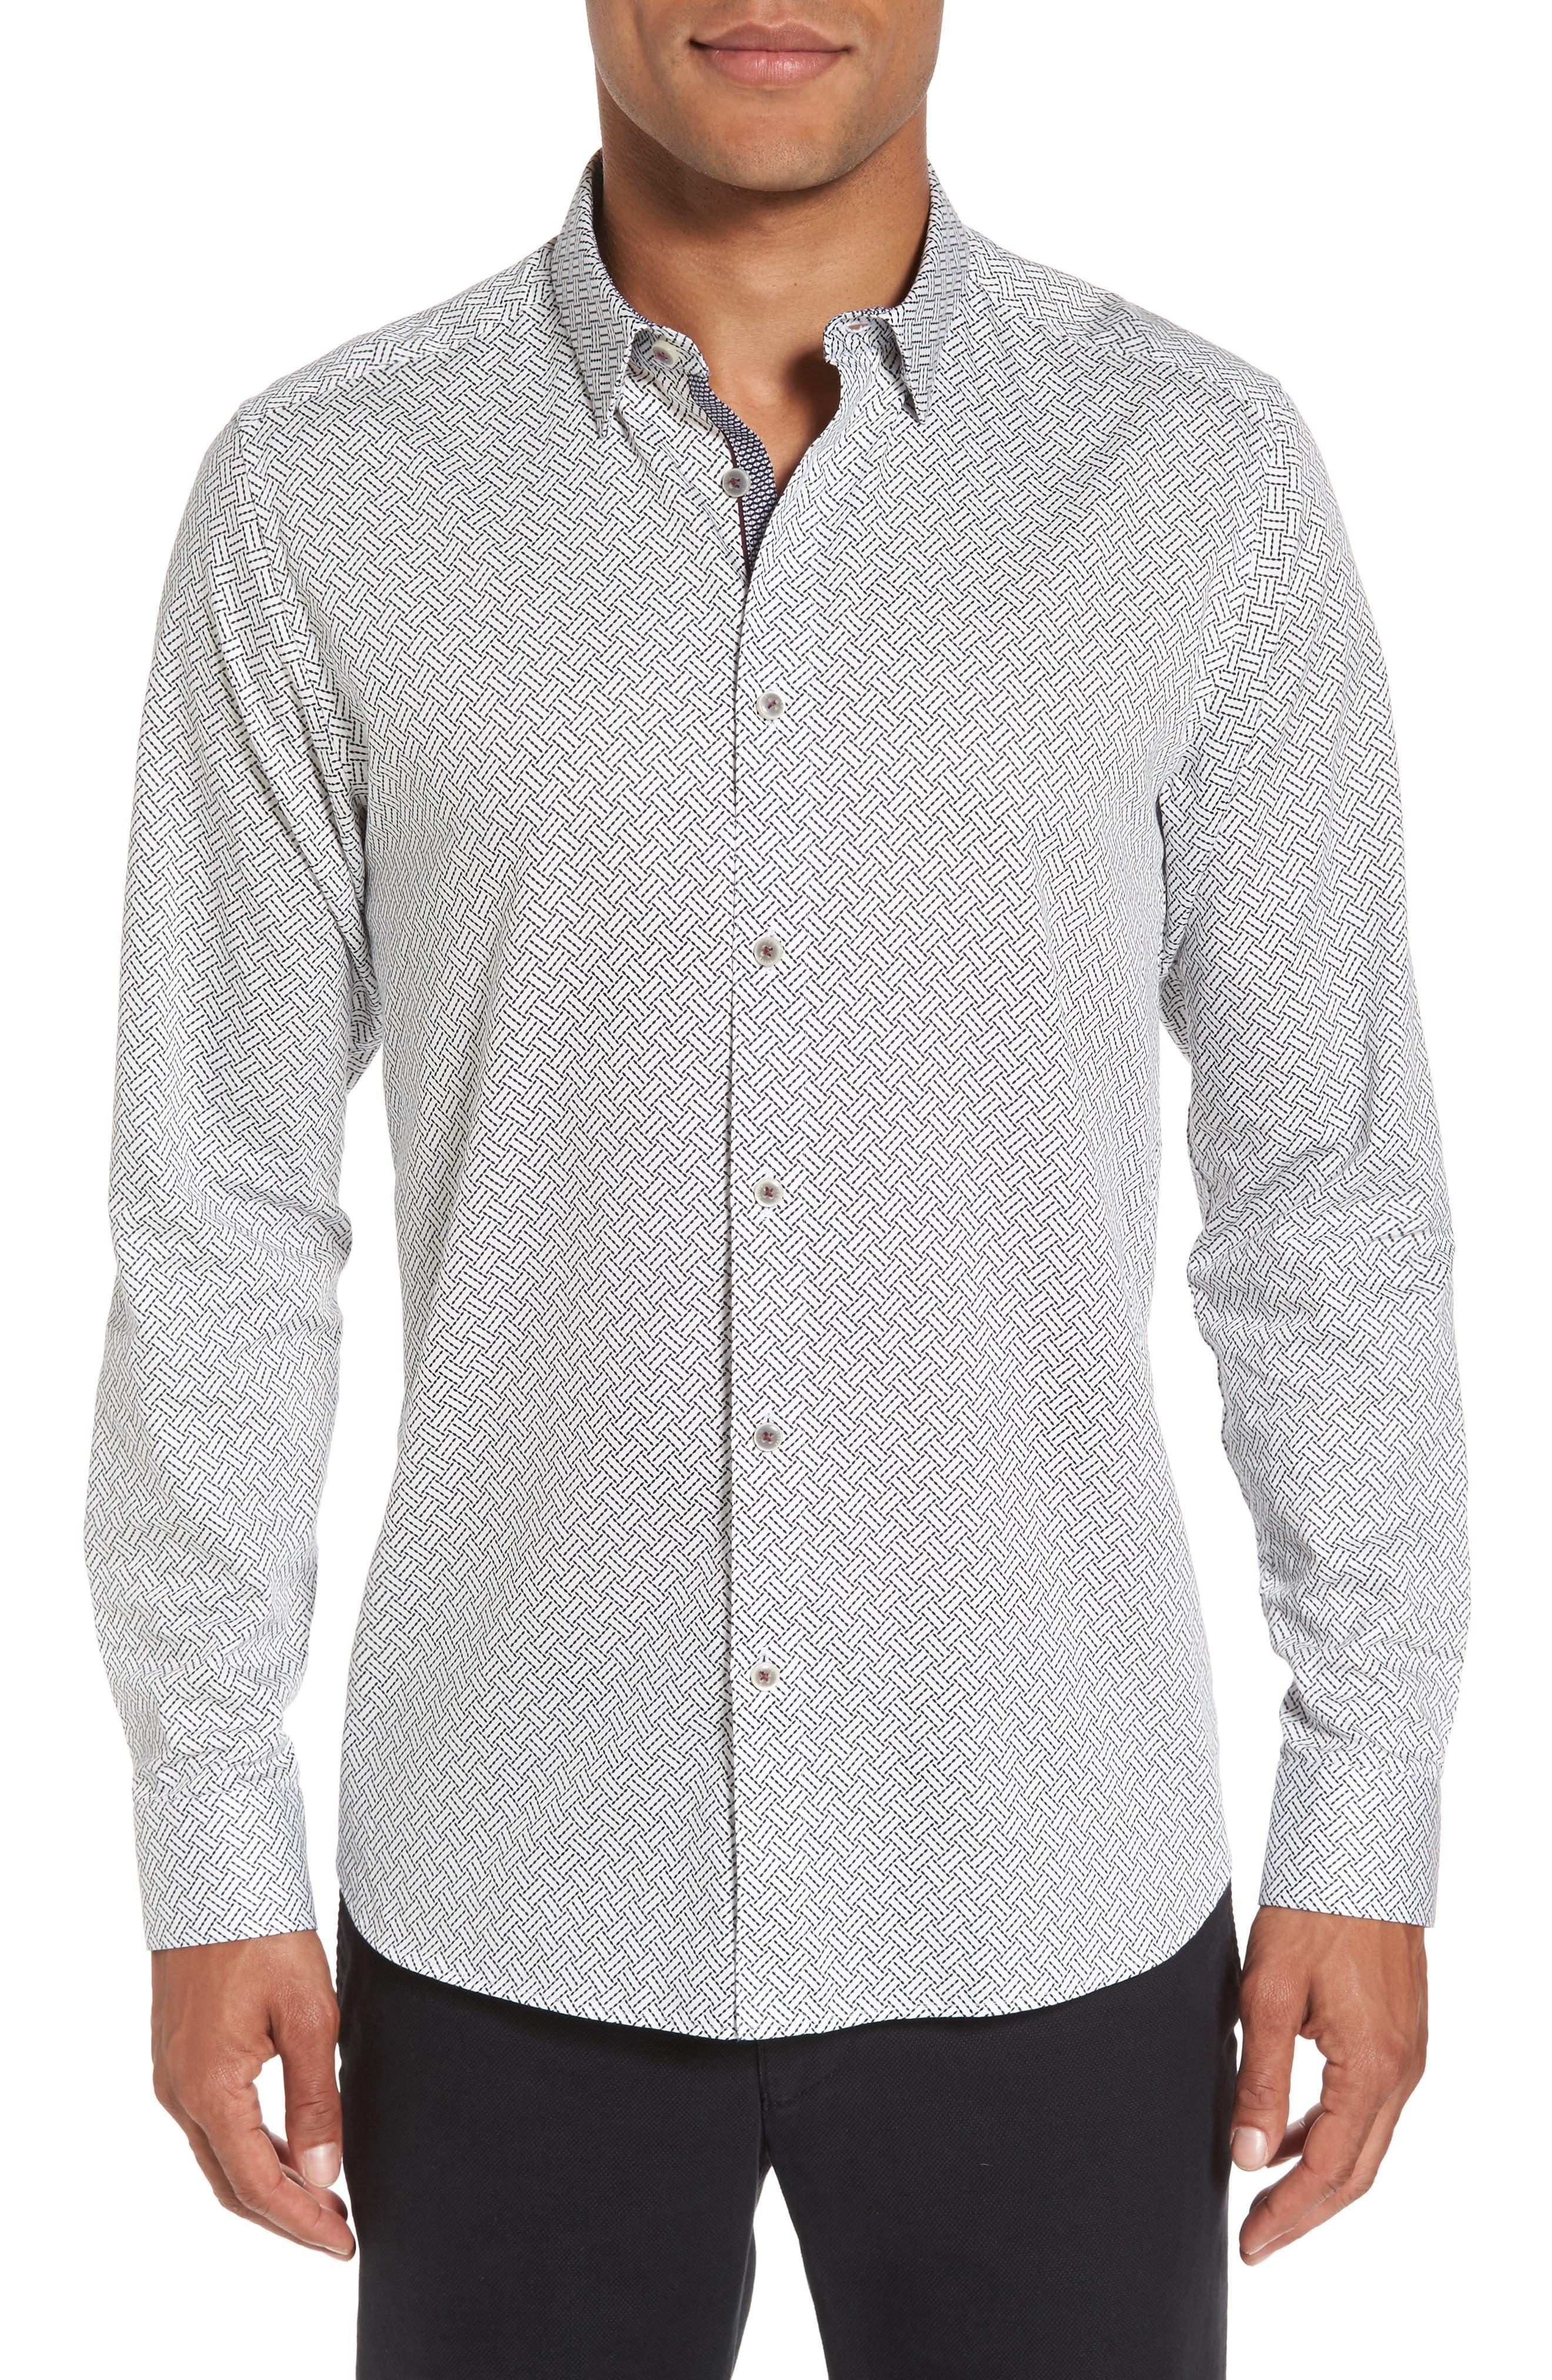 Larosh Slim Fit Basket Weave Print Sport Shirt,                             Main thumbnail 1, color,                             White